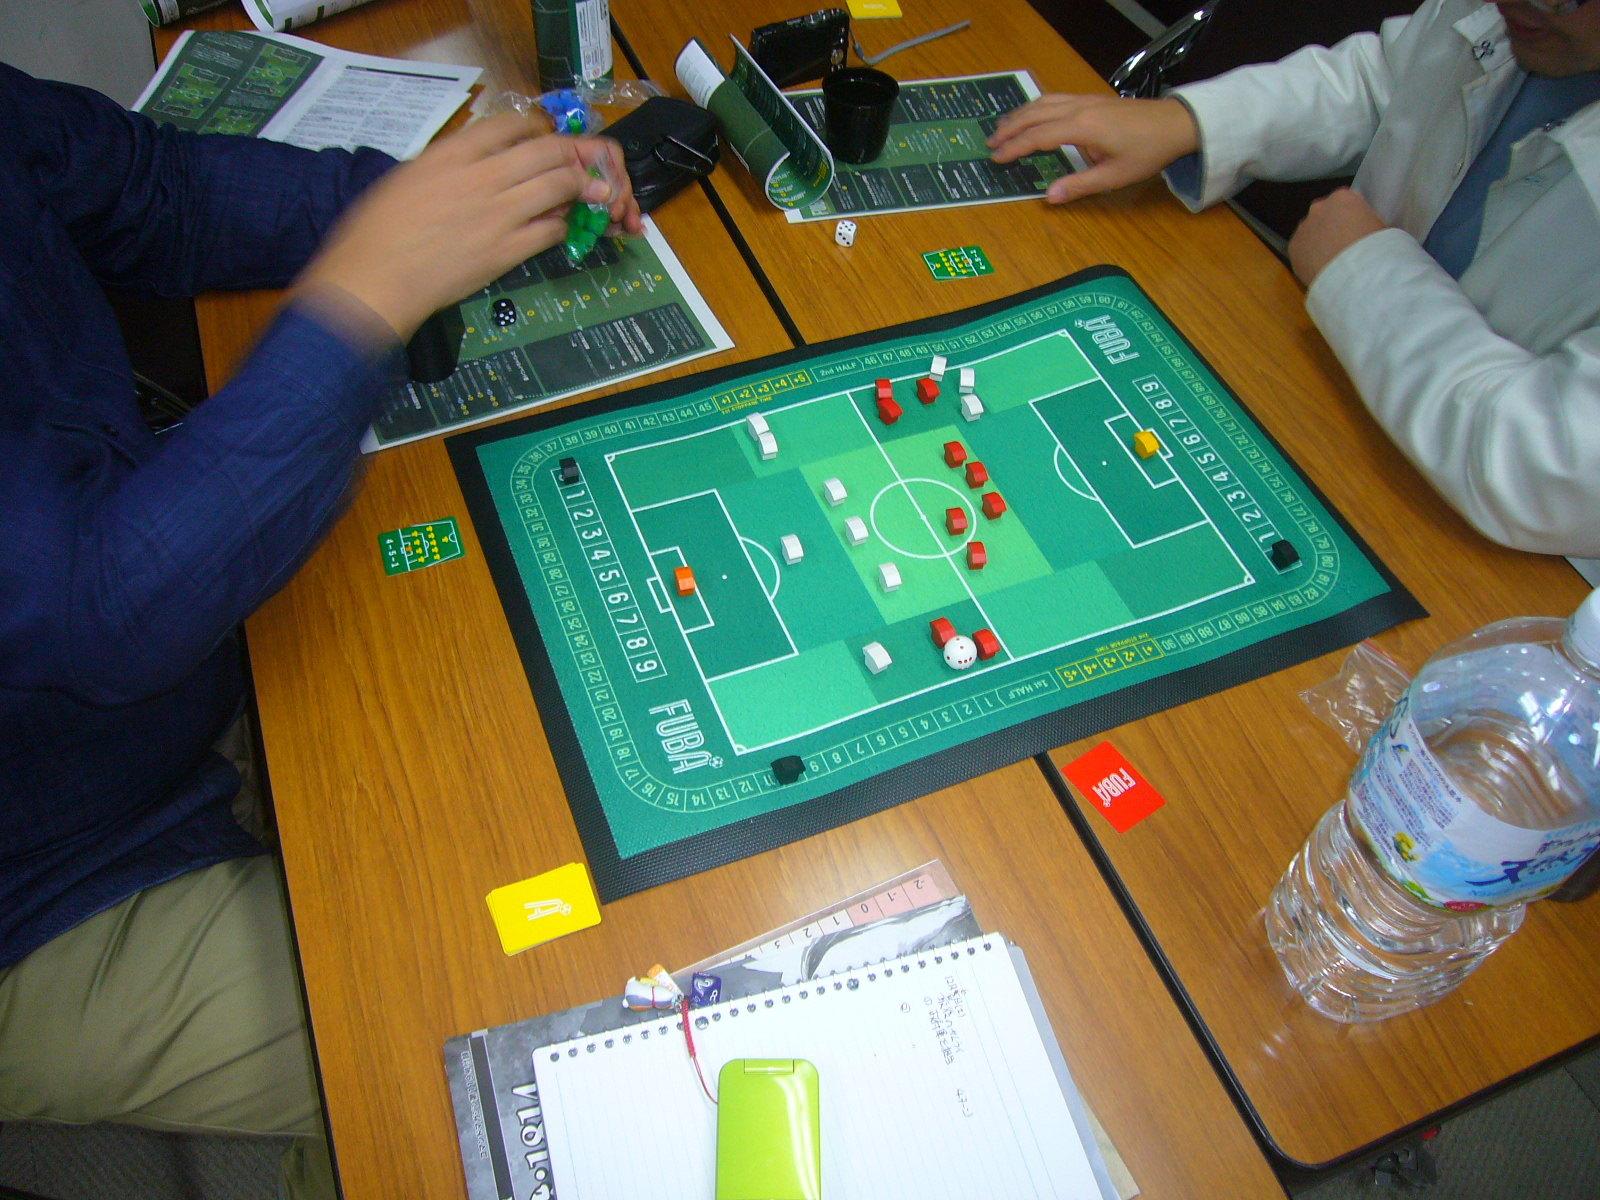 YSGA(横浜シミュレーションゲーム協会) 例会報告